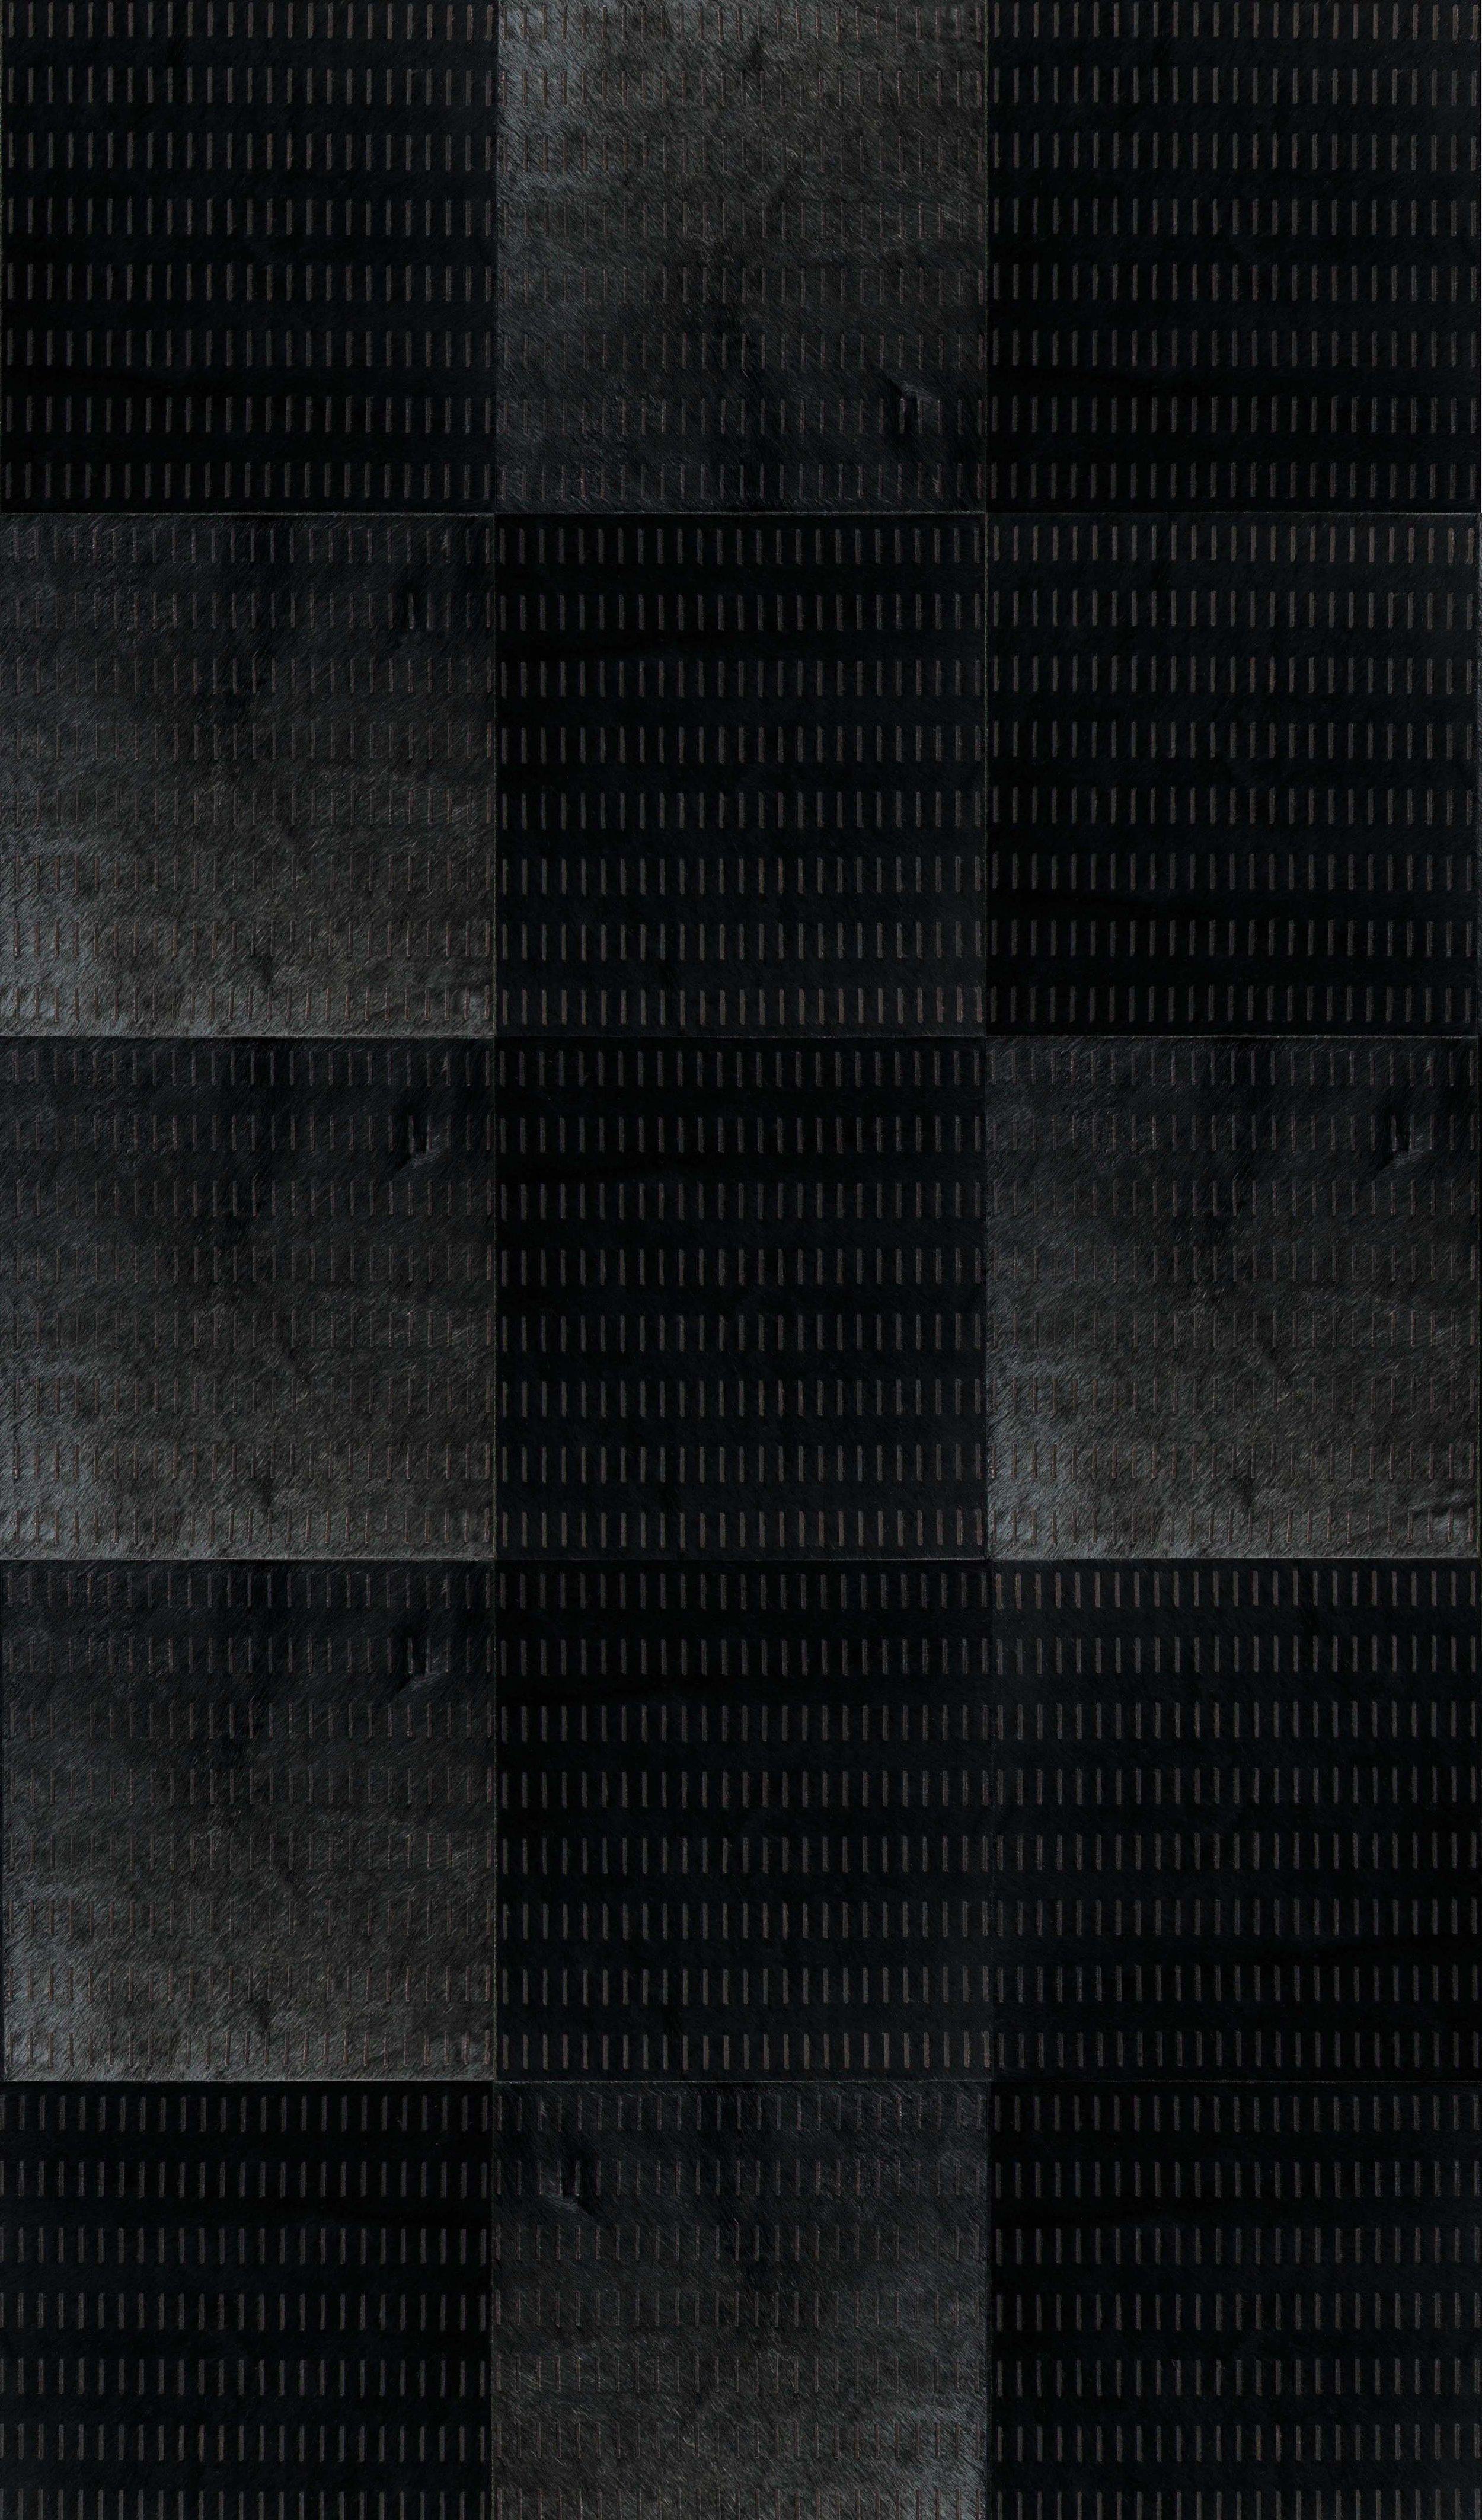 perus-detroit1-02.jpg